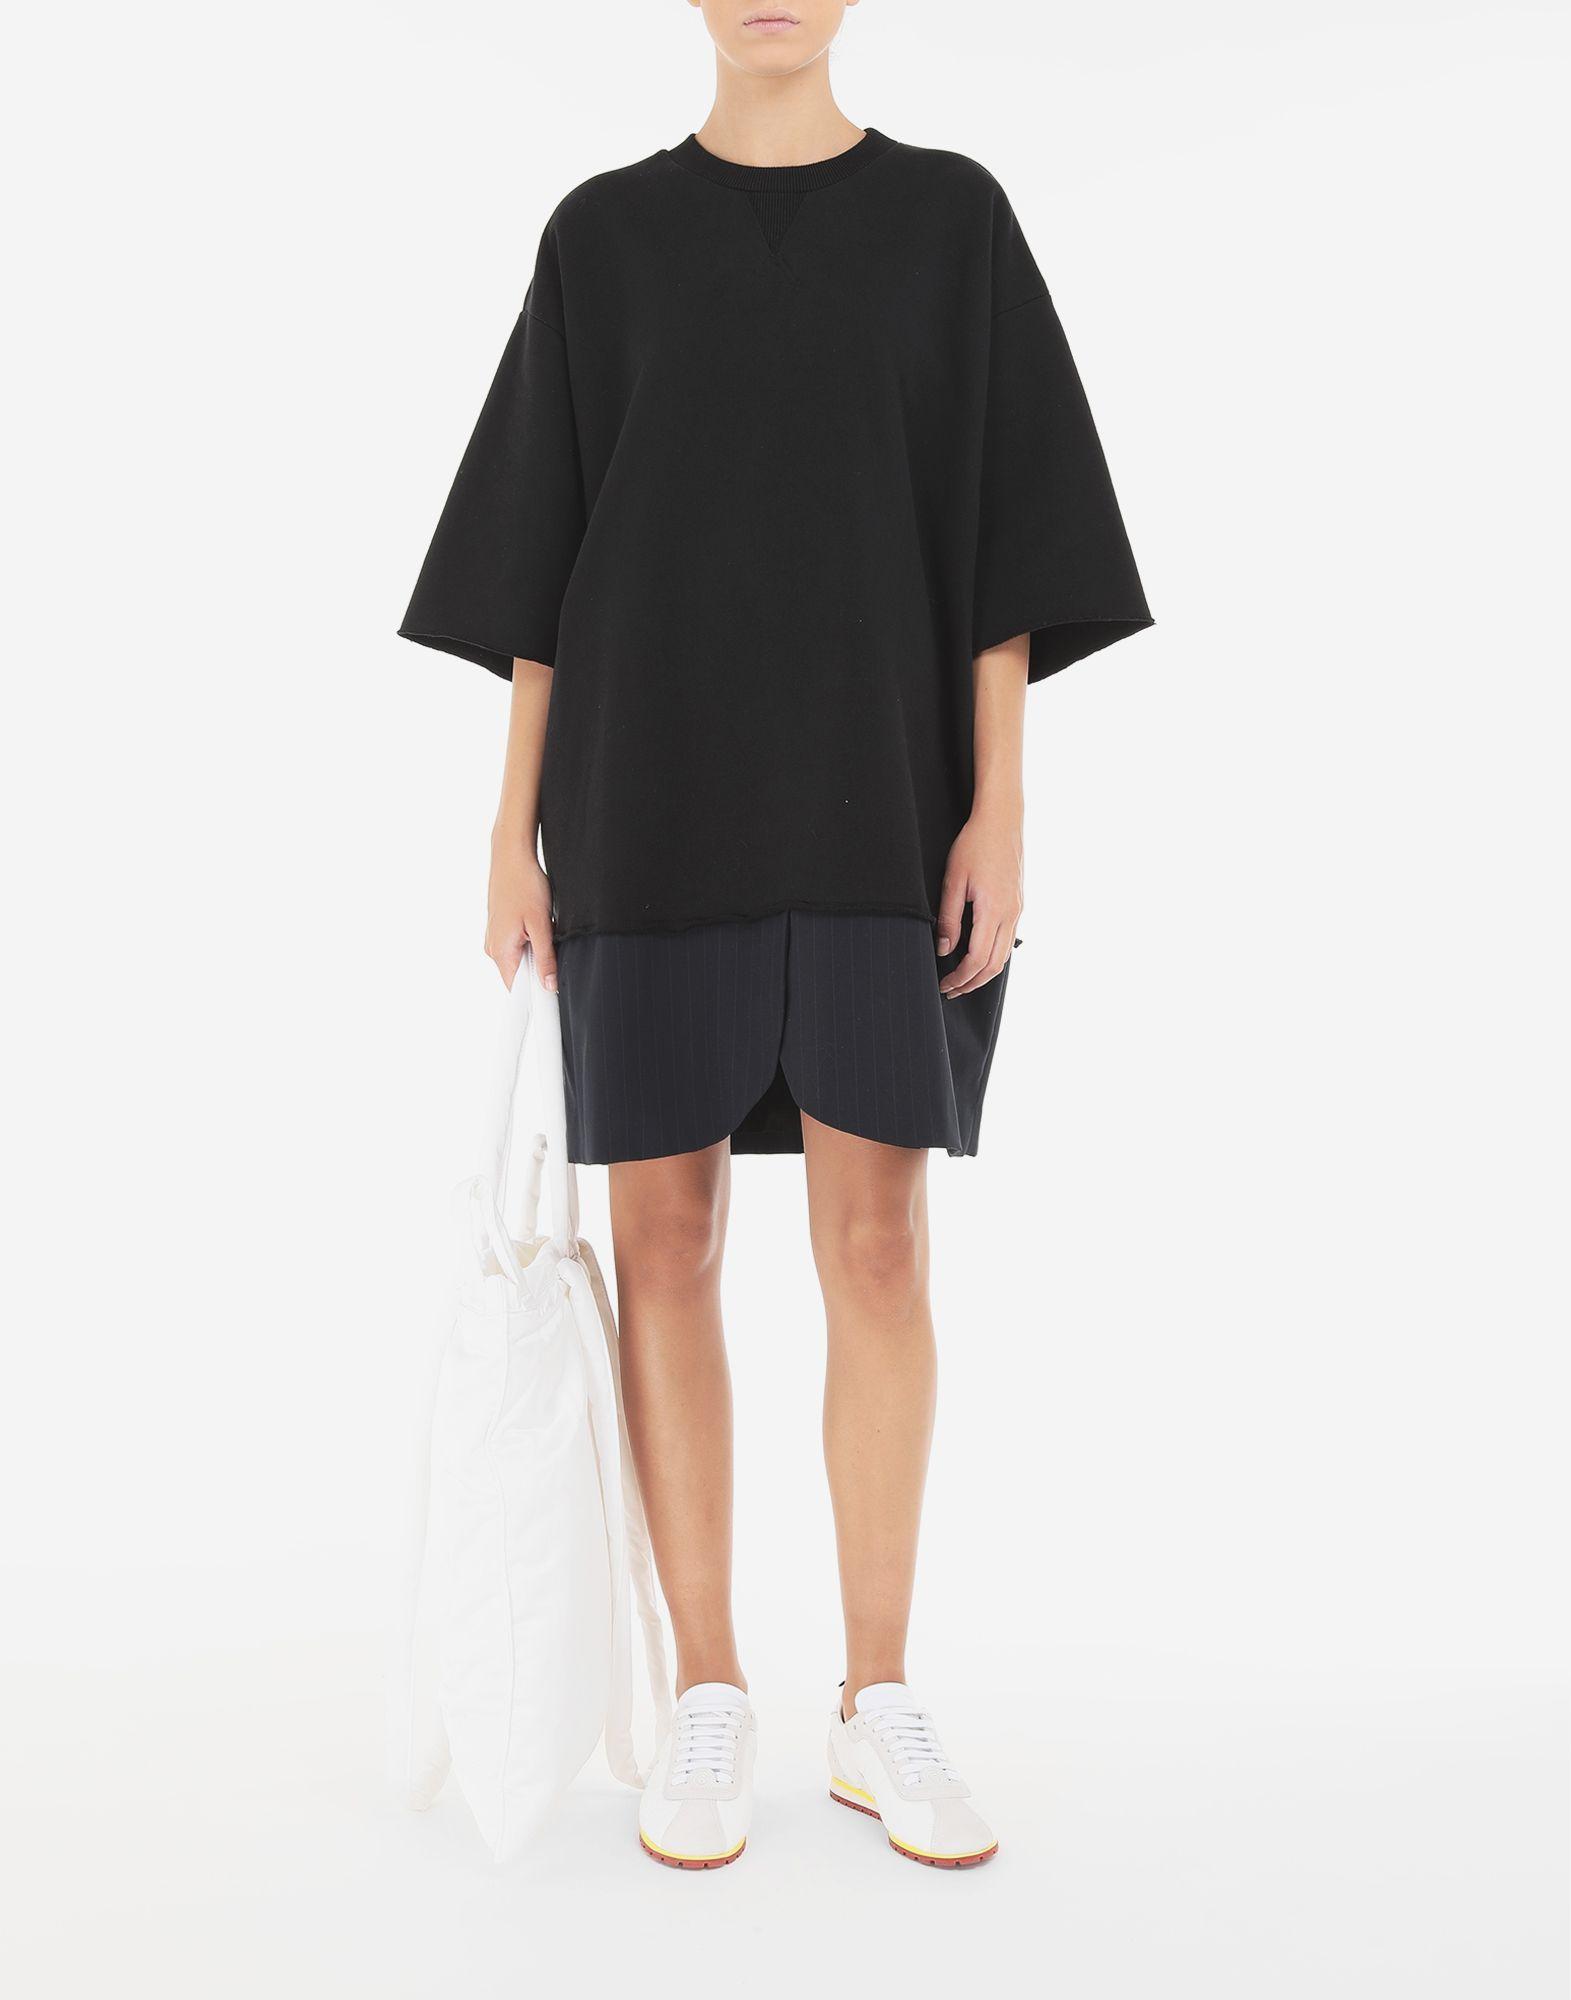 MM6 MAISON MARGIELA Vestido camisero Spliced Minivestido Mujer e